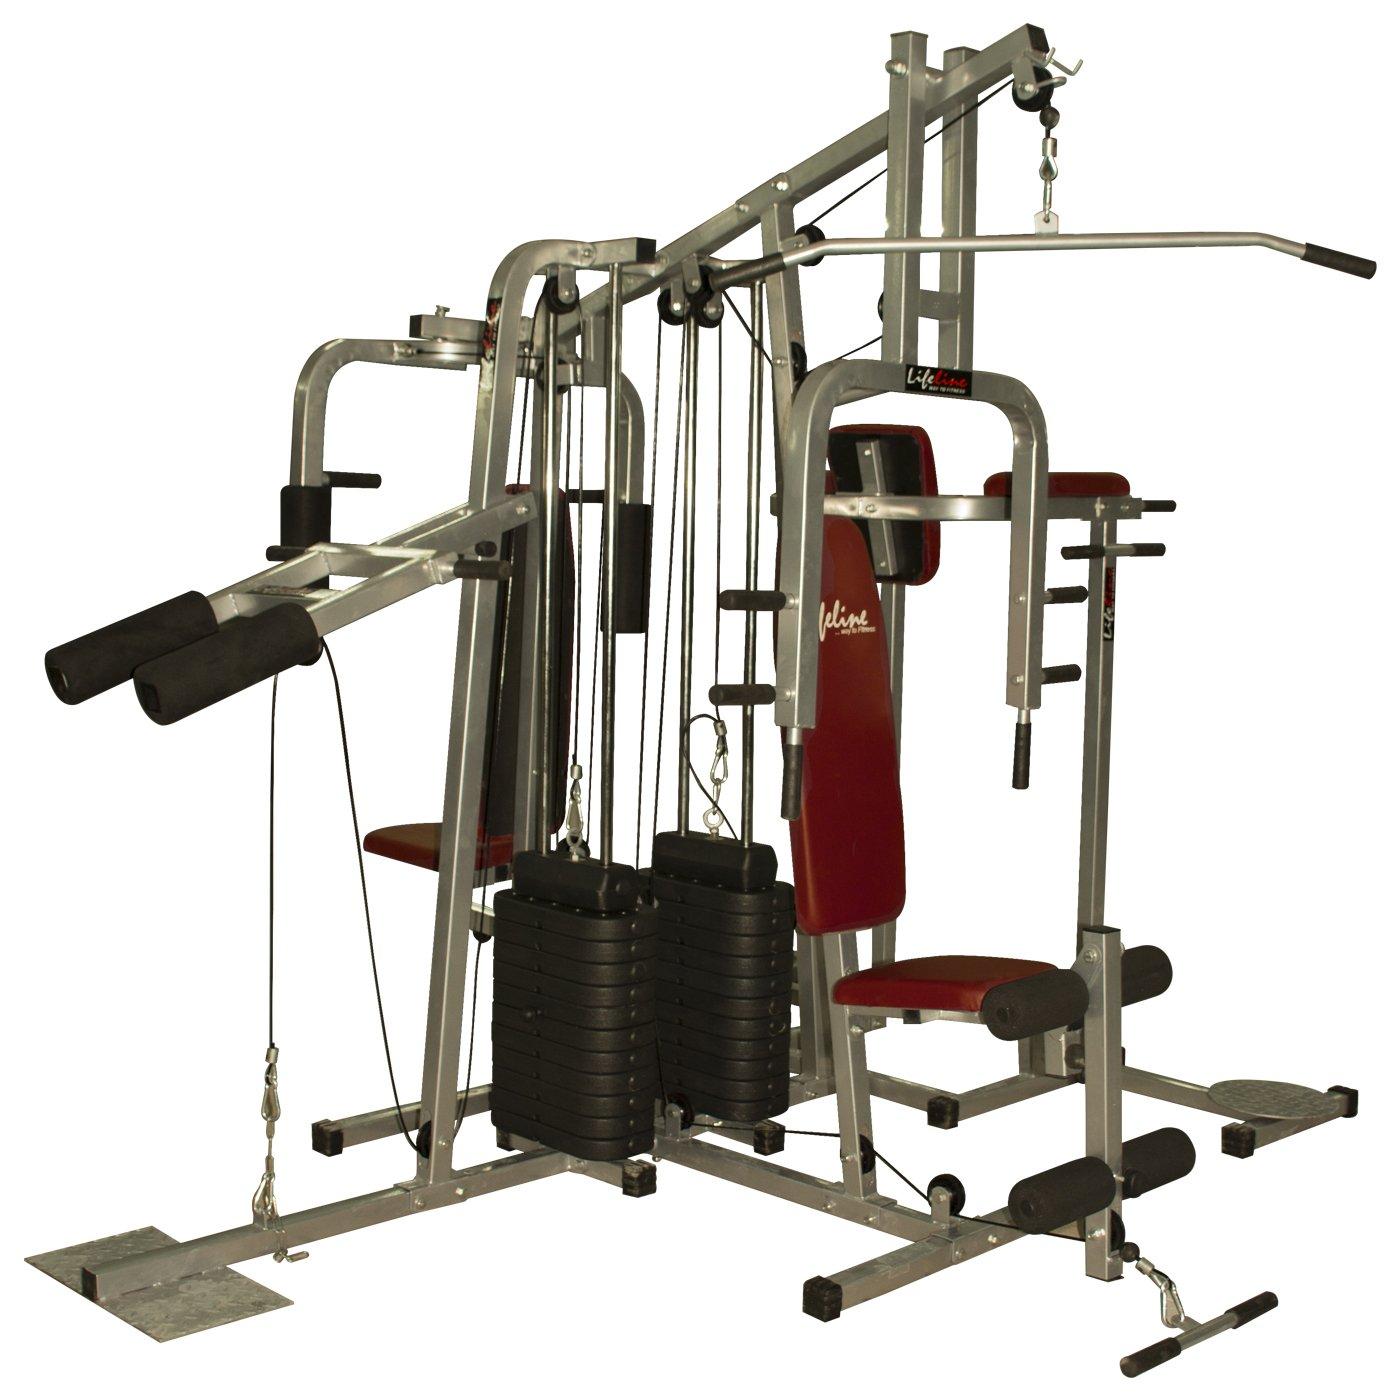 Gym Equipment Kolkata: Anotherhackedlife.com